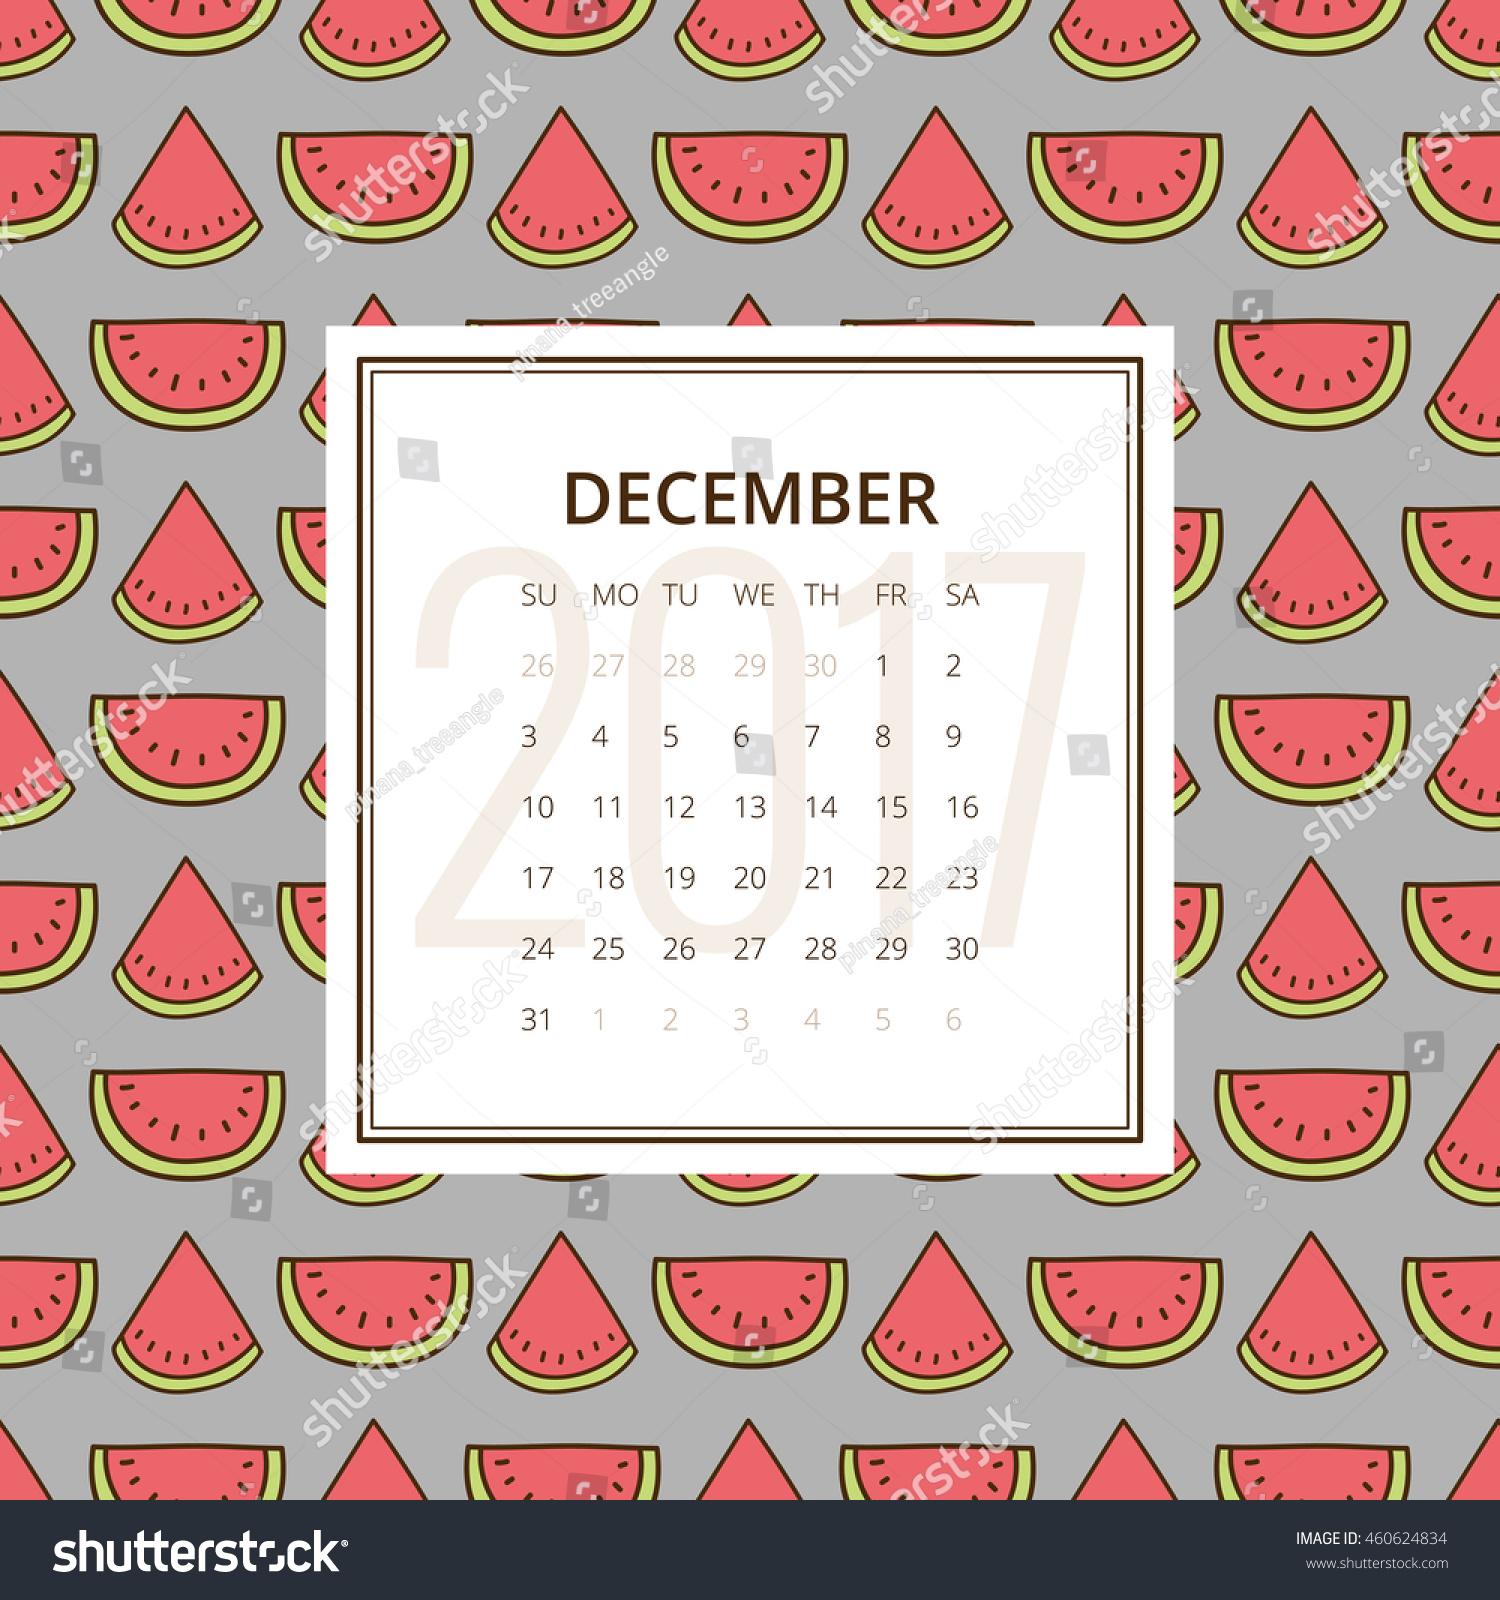 December 2017 One Month Calendar Vector Stock Vector Royalty Free